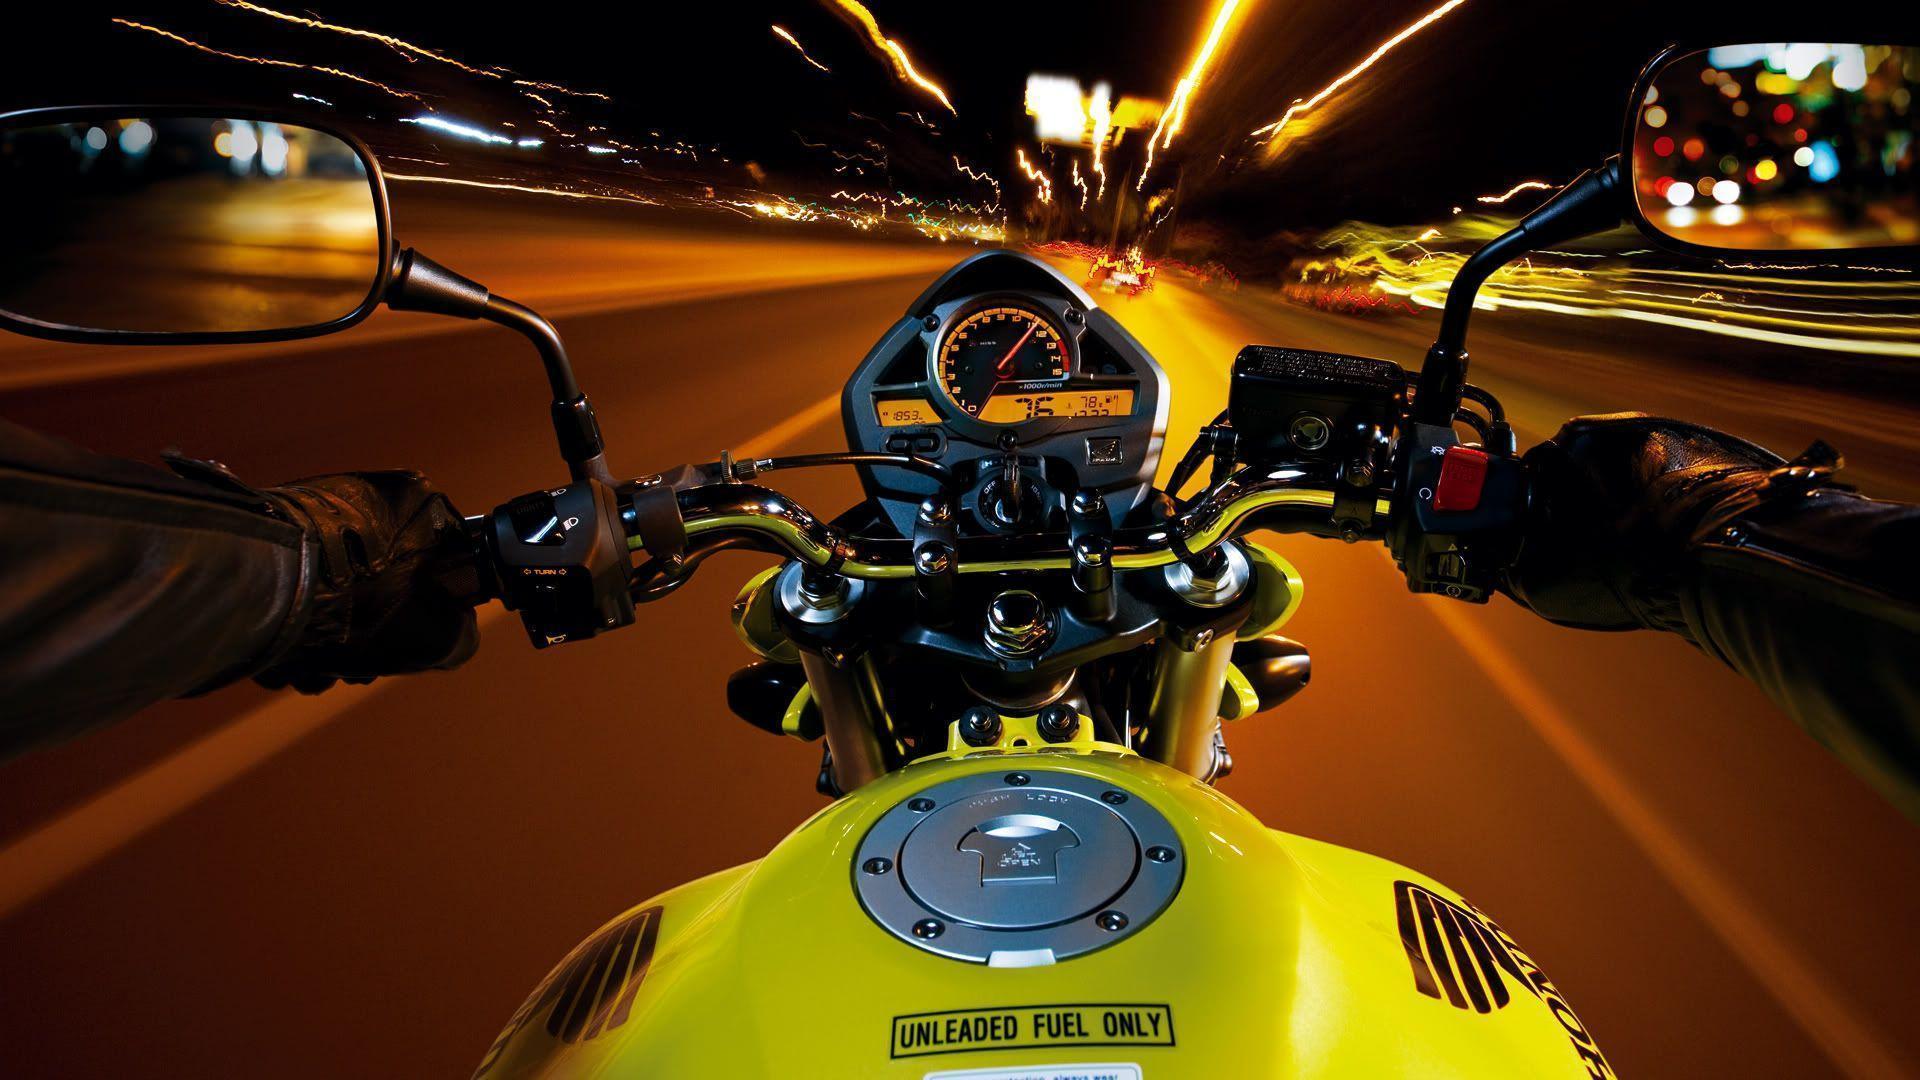 ukmoto import moto moto occasion moto anglaise moto angleterre 23 - ENQUETE SATISFACTION SUR L'ACHAT DE MOTO ANGLAISE UKMOTO IMPORT